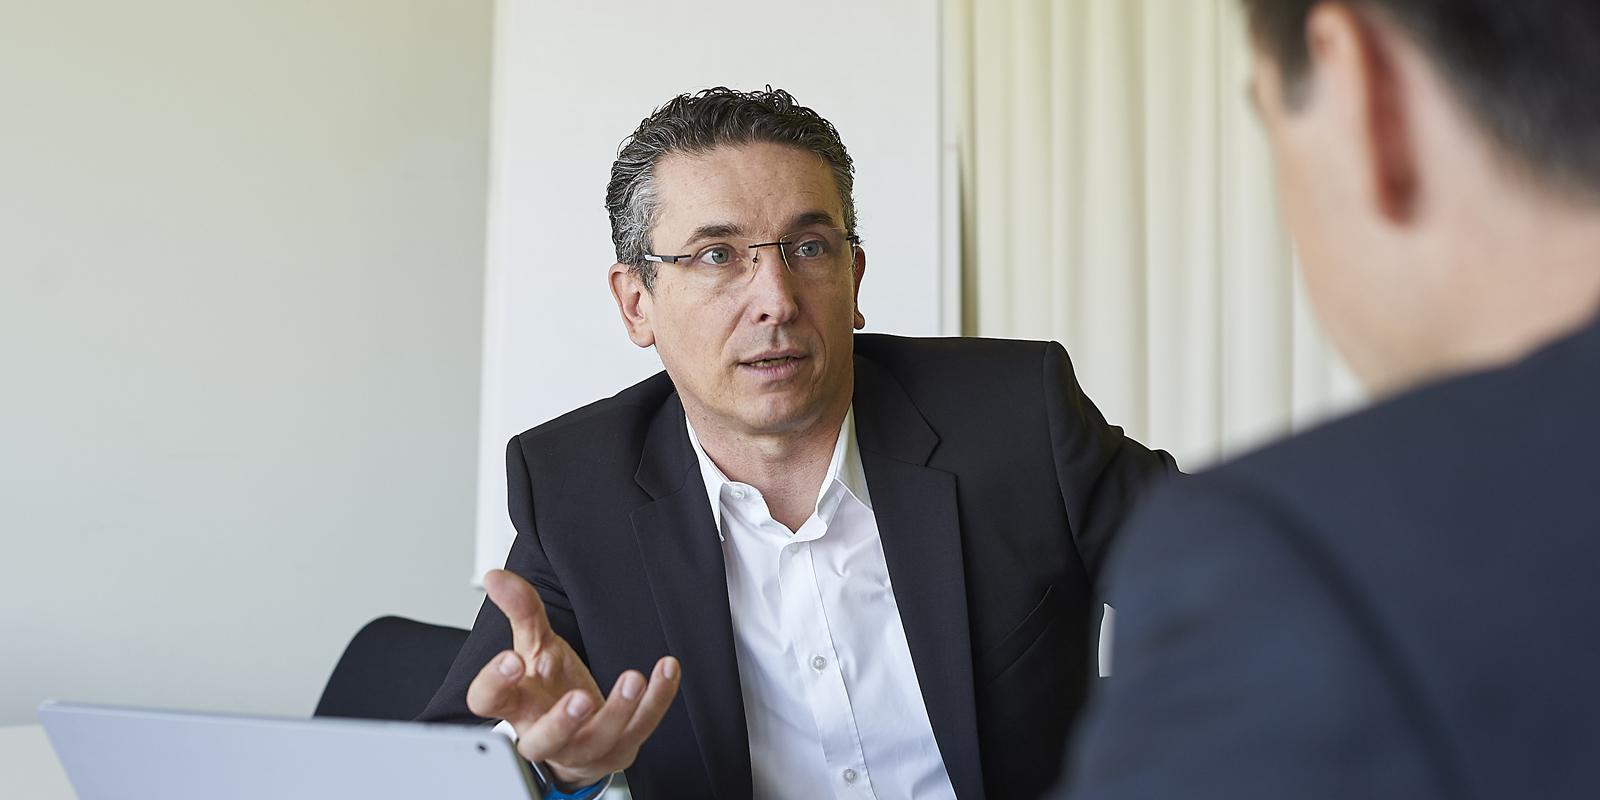 Stefano Mallè CTO Microsoft Schweiz